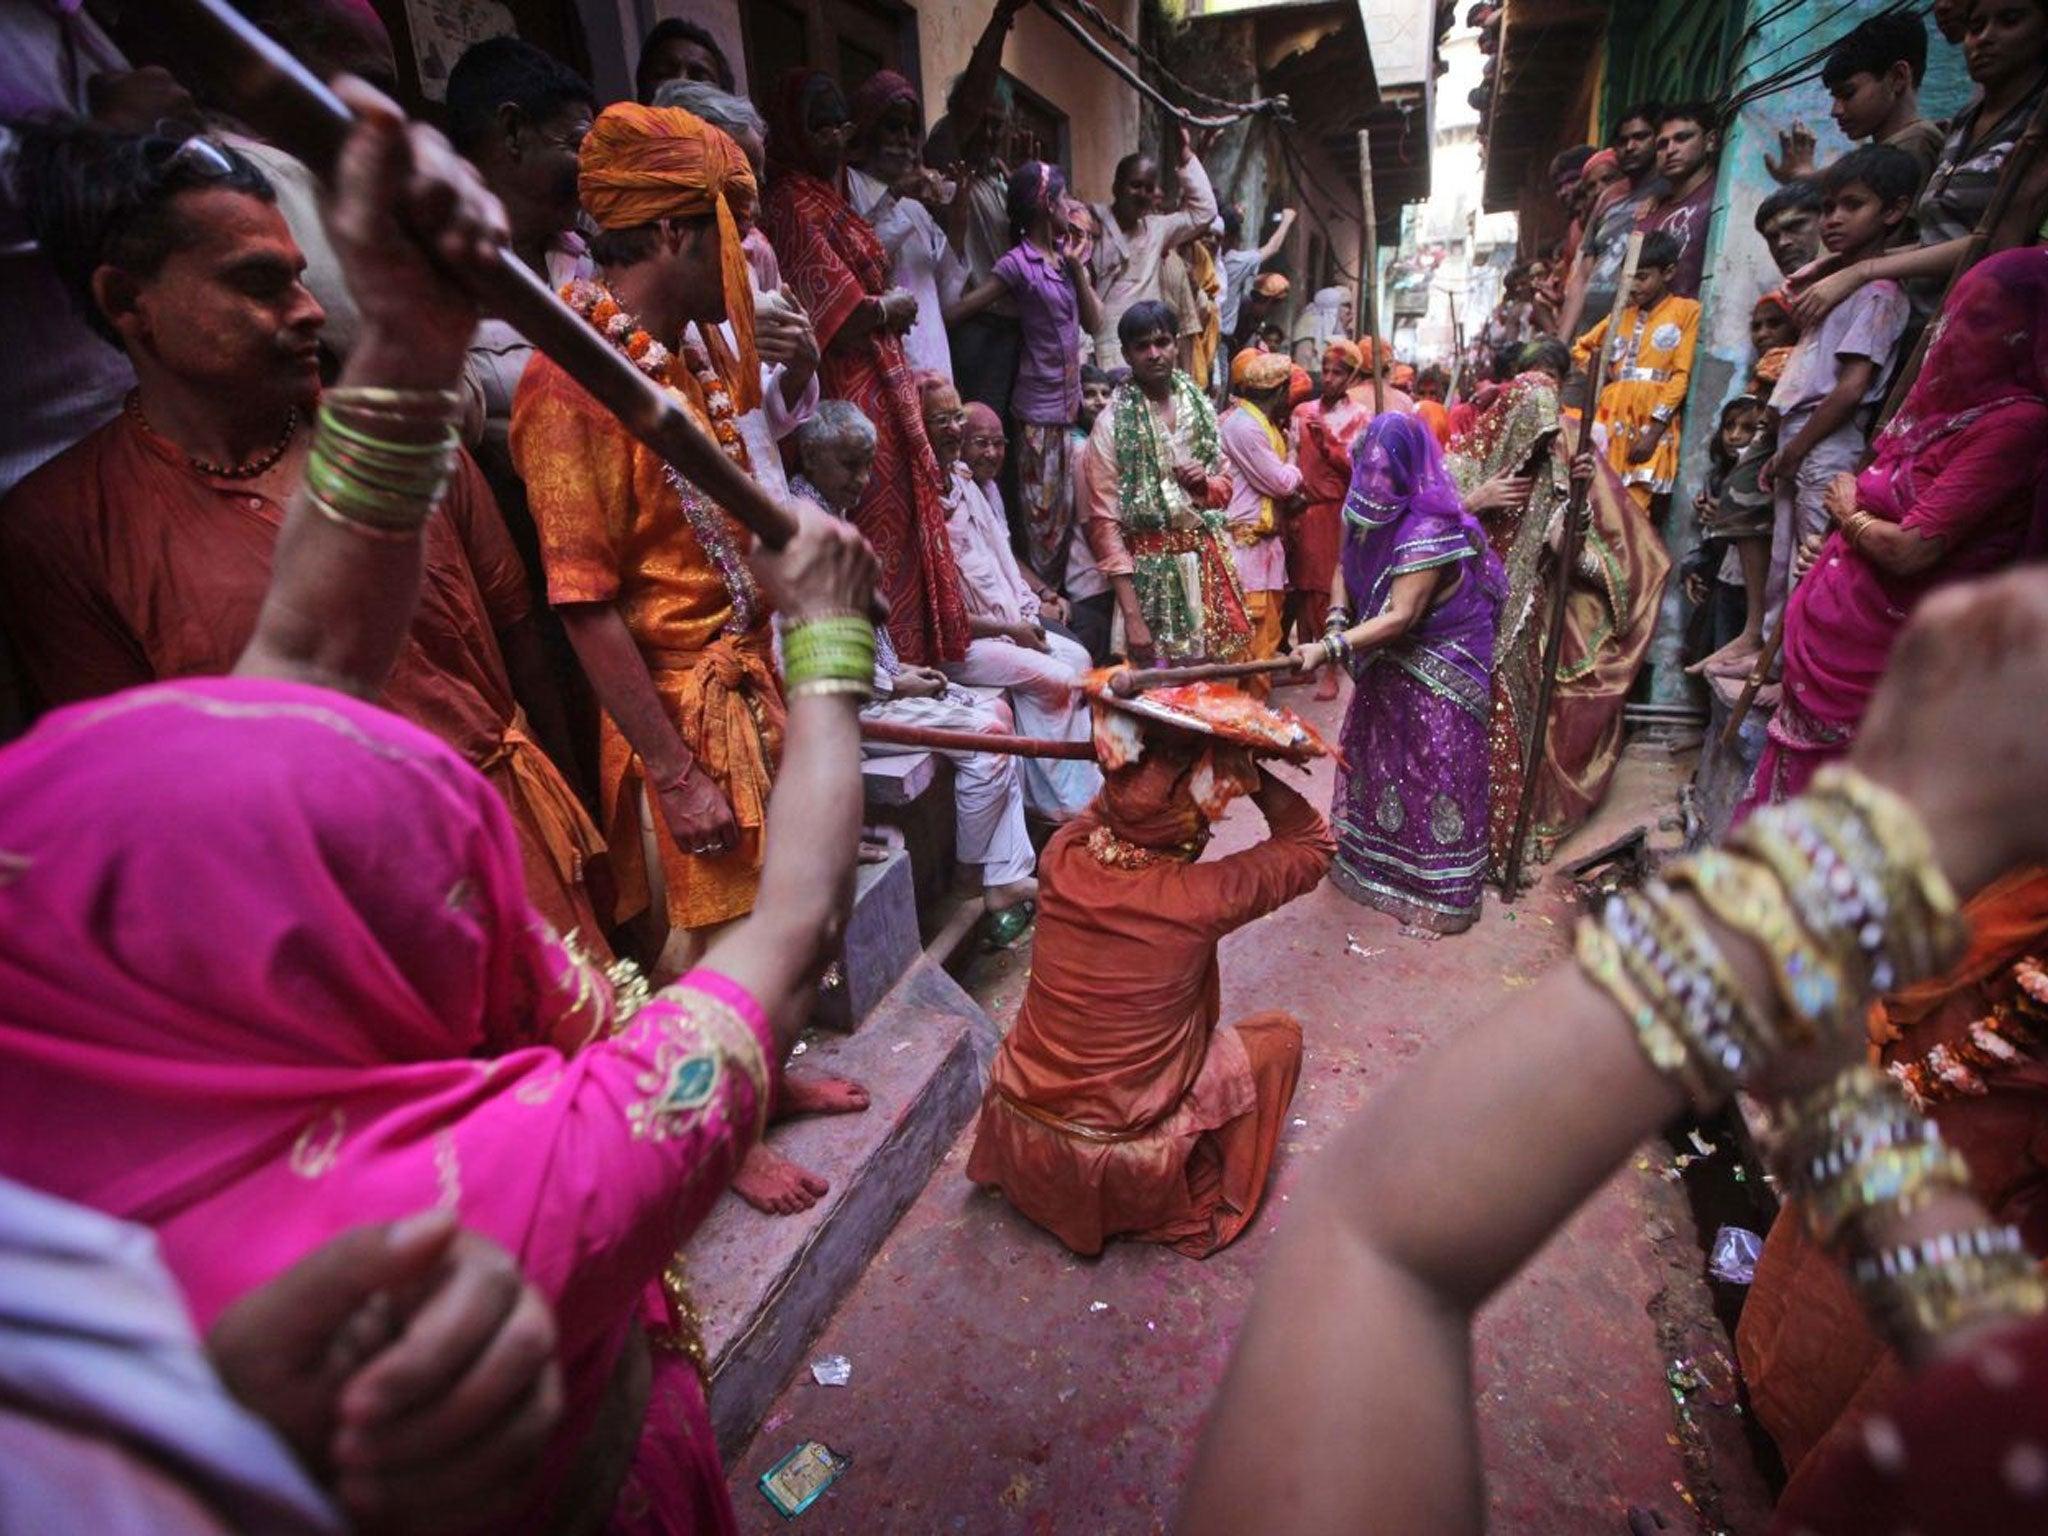 Hindus condemn CNN presenter who ate human brain during documentary